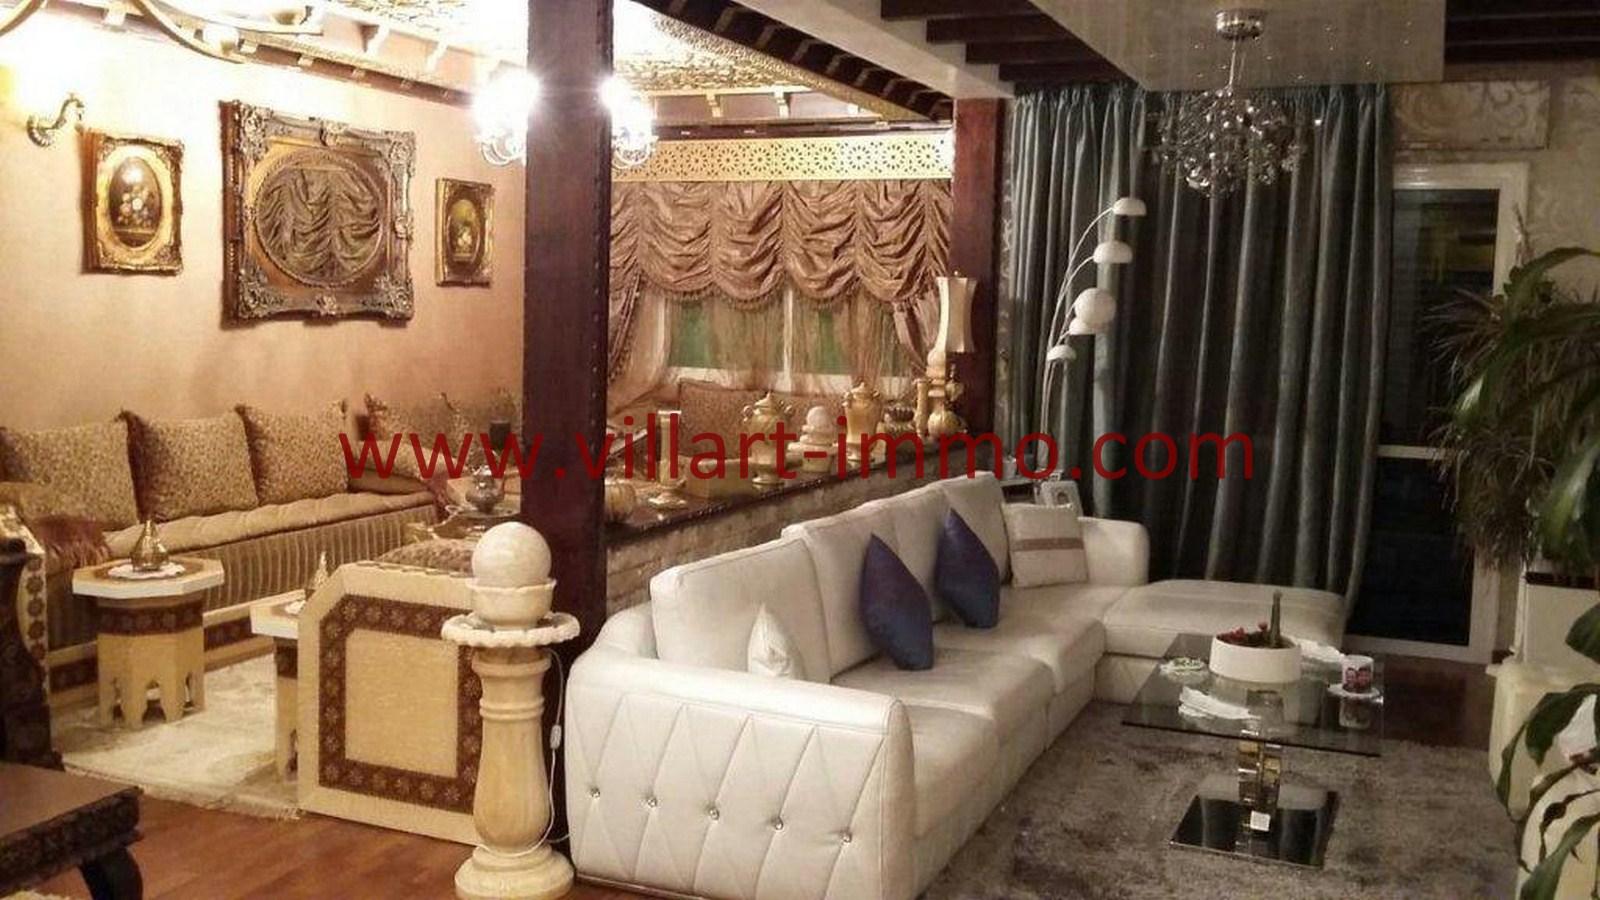 4-Vente-Appartement-Tanger- Sejour-VA560-Villart Immo